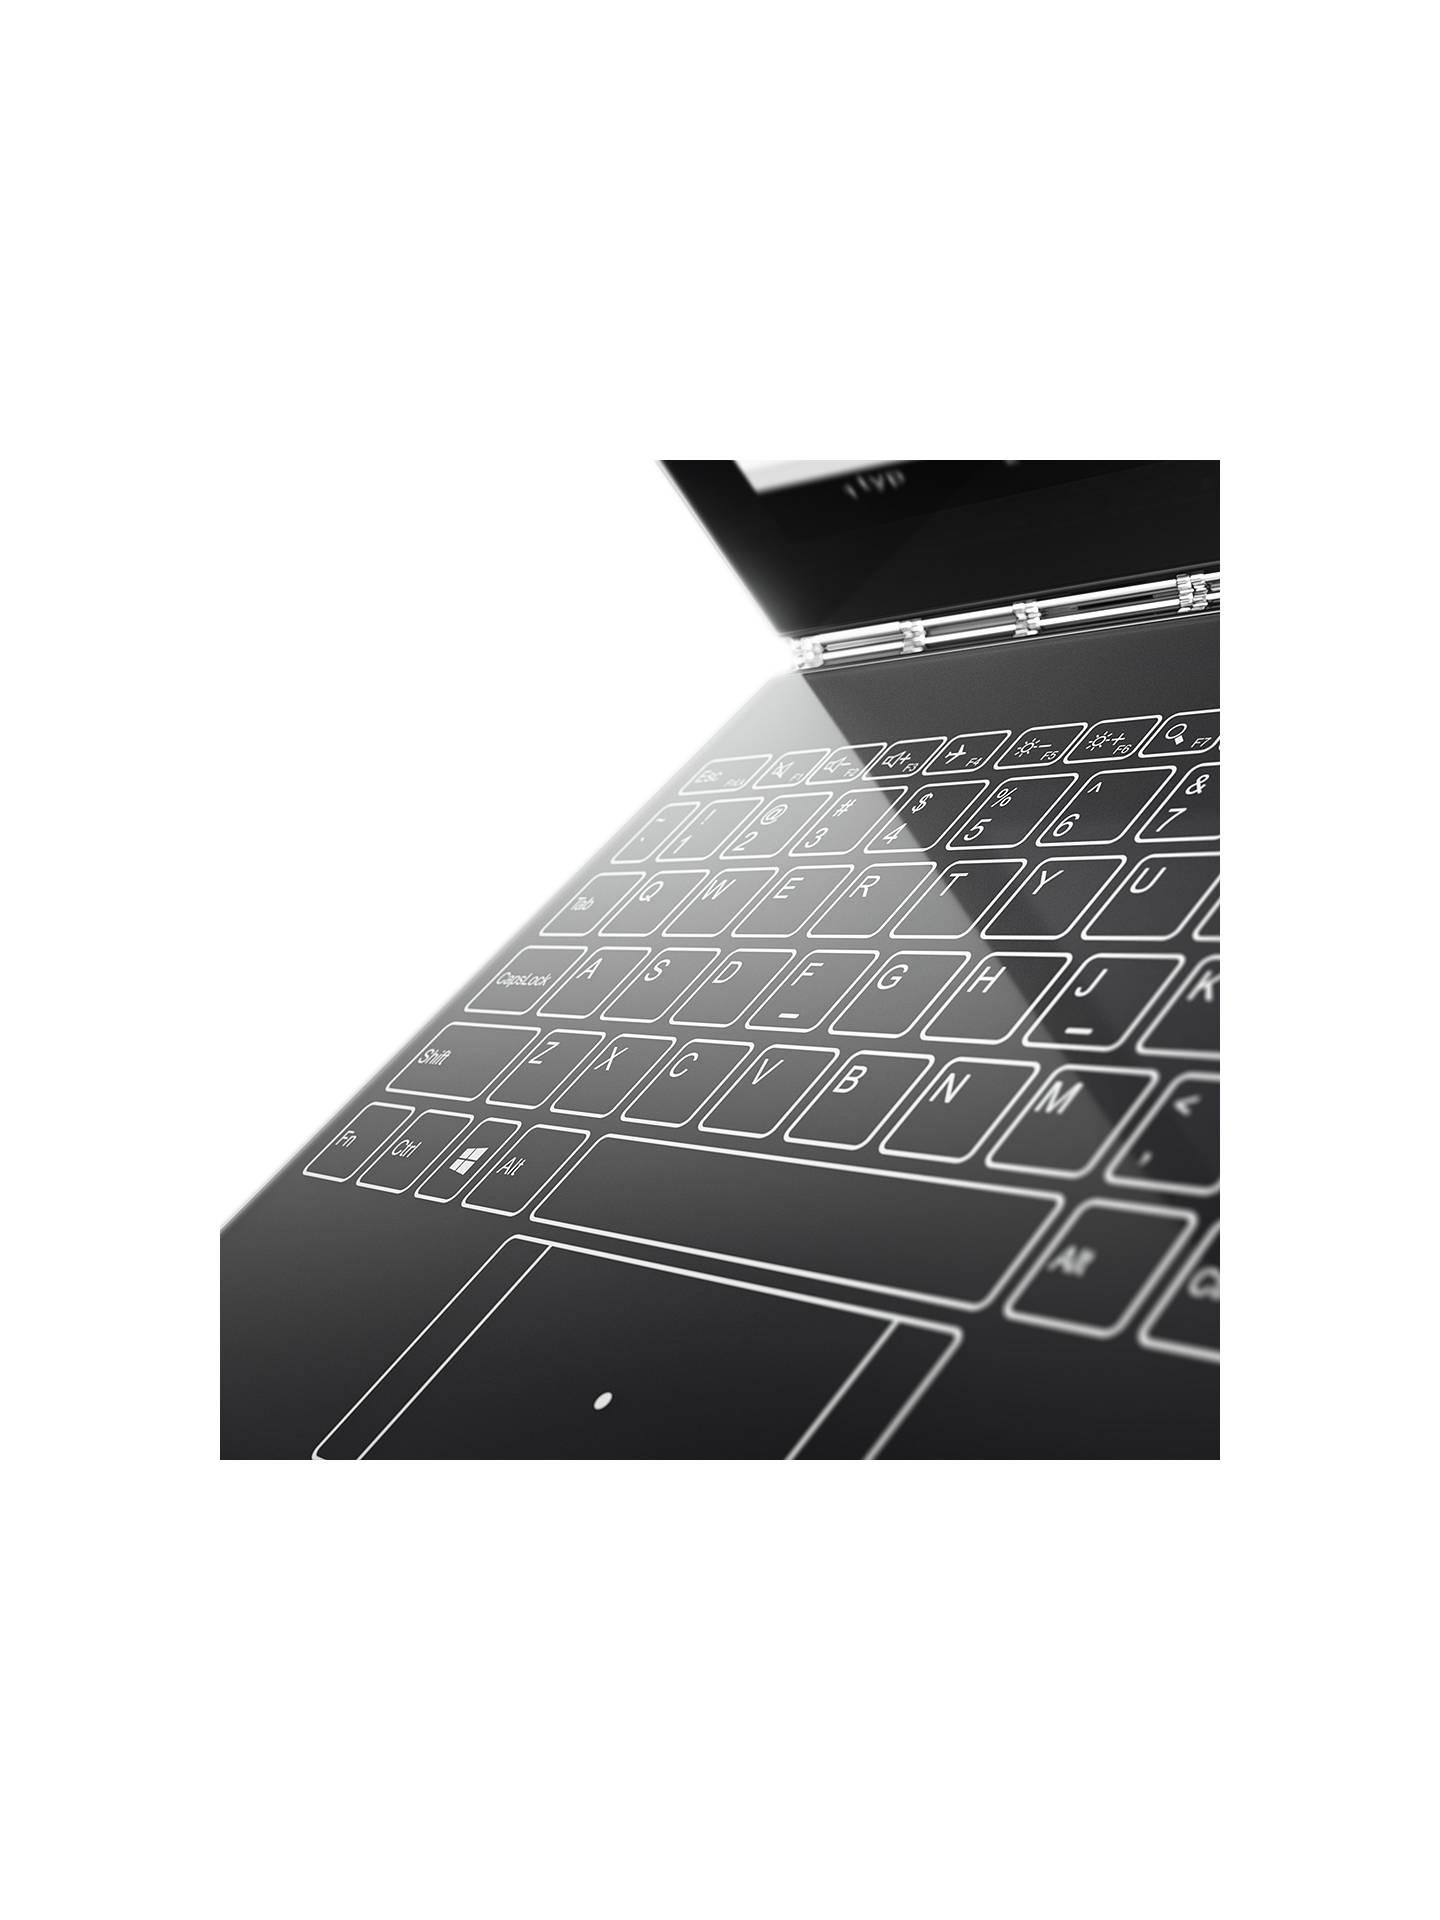 Lenovo Yoga Book Convertible Laptop, Intel Atom, 4GB RAM, 64GB SSD, Windows  OS, 10